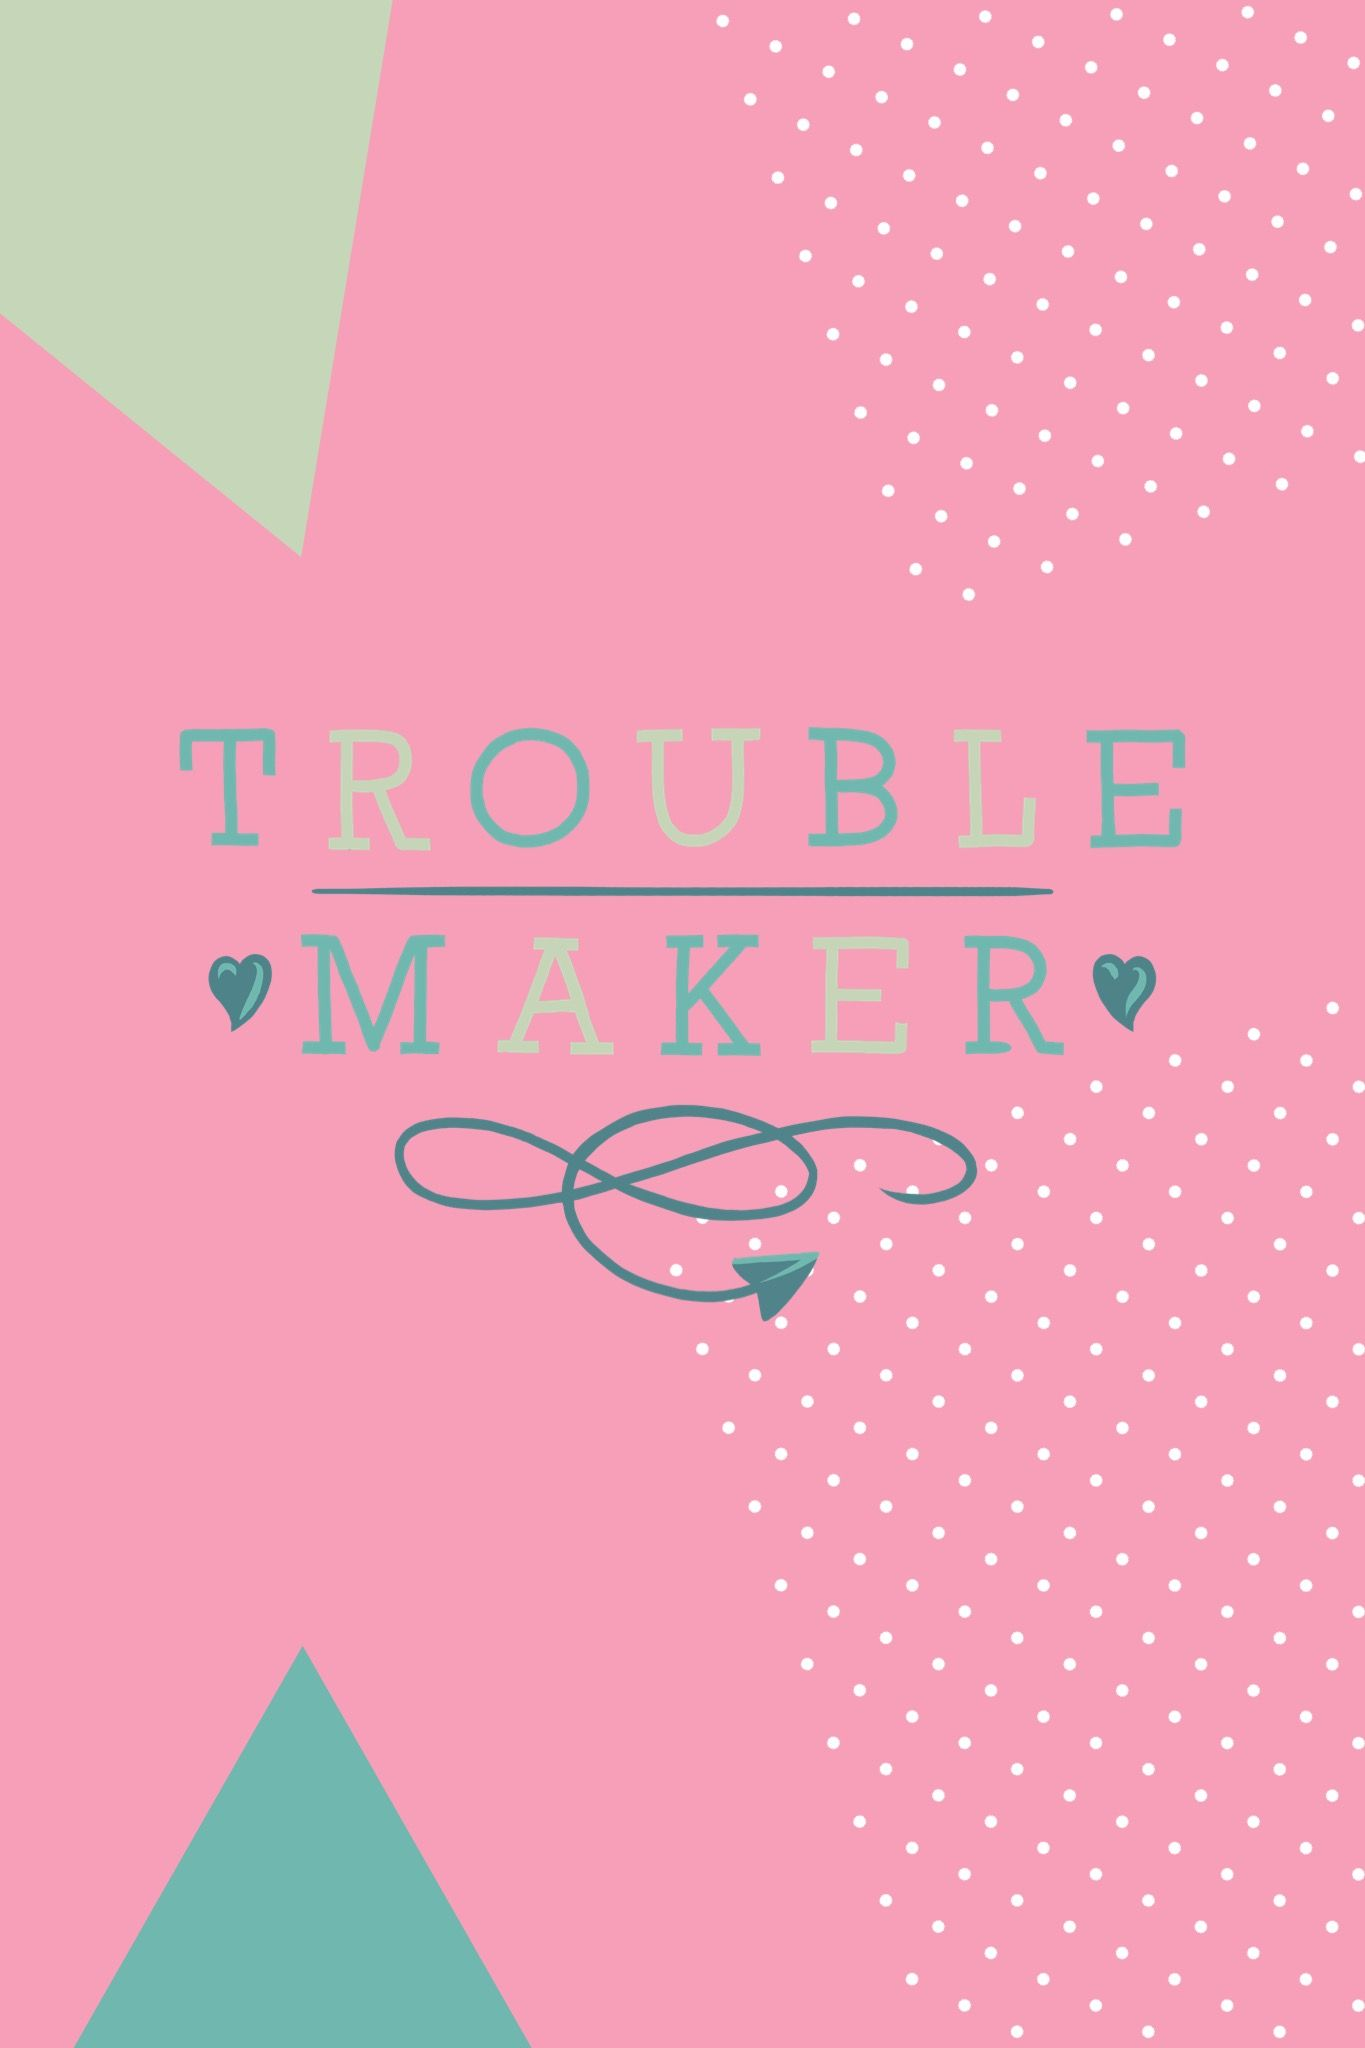 Trouble maker. madewithover Wallpaper maker app